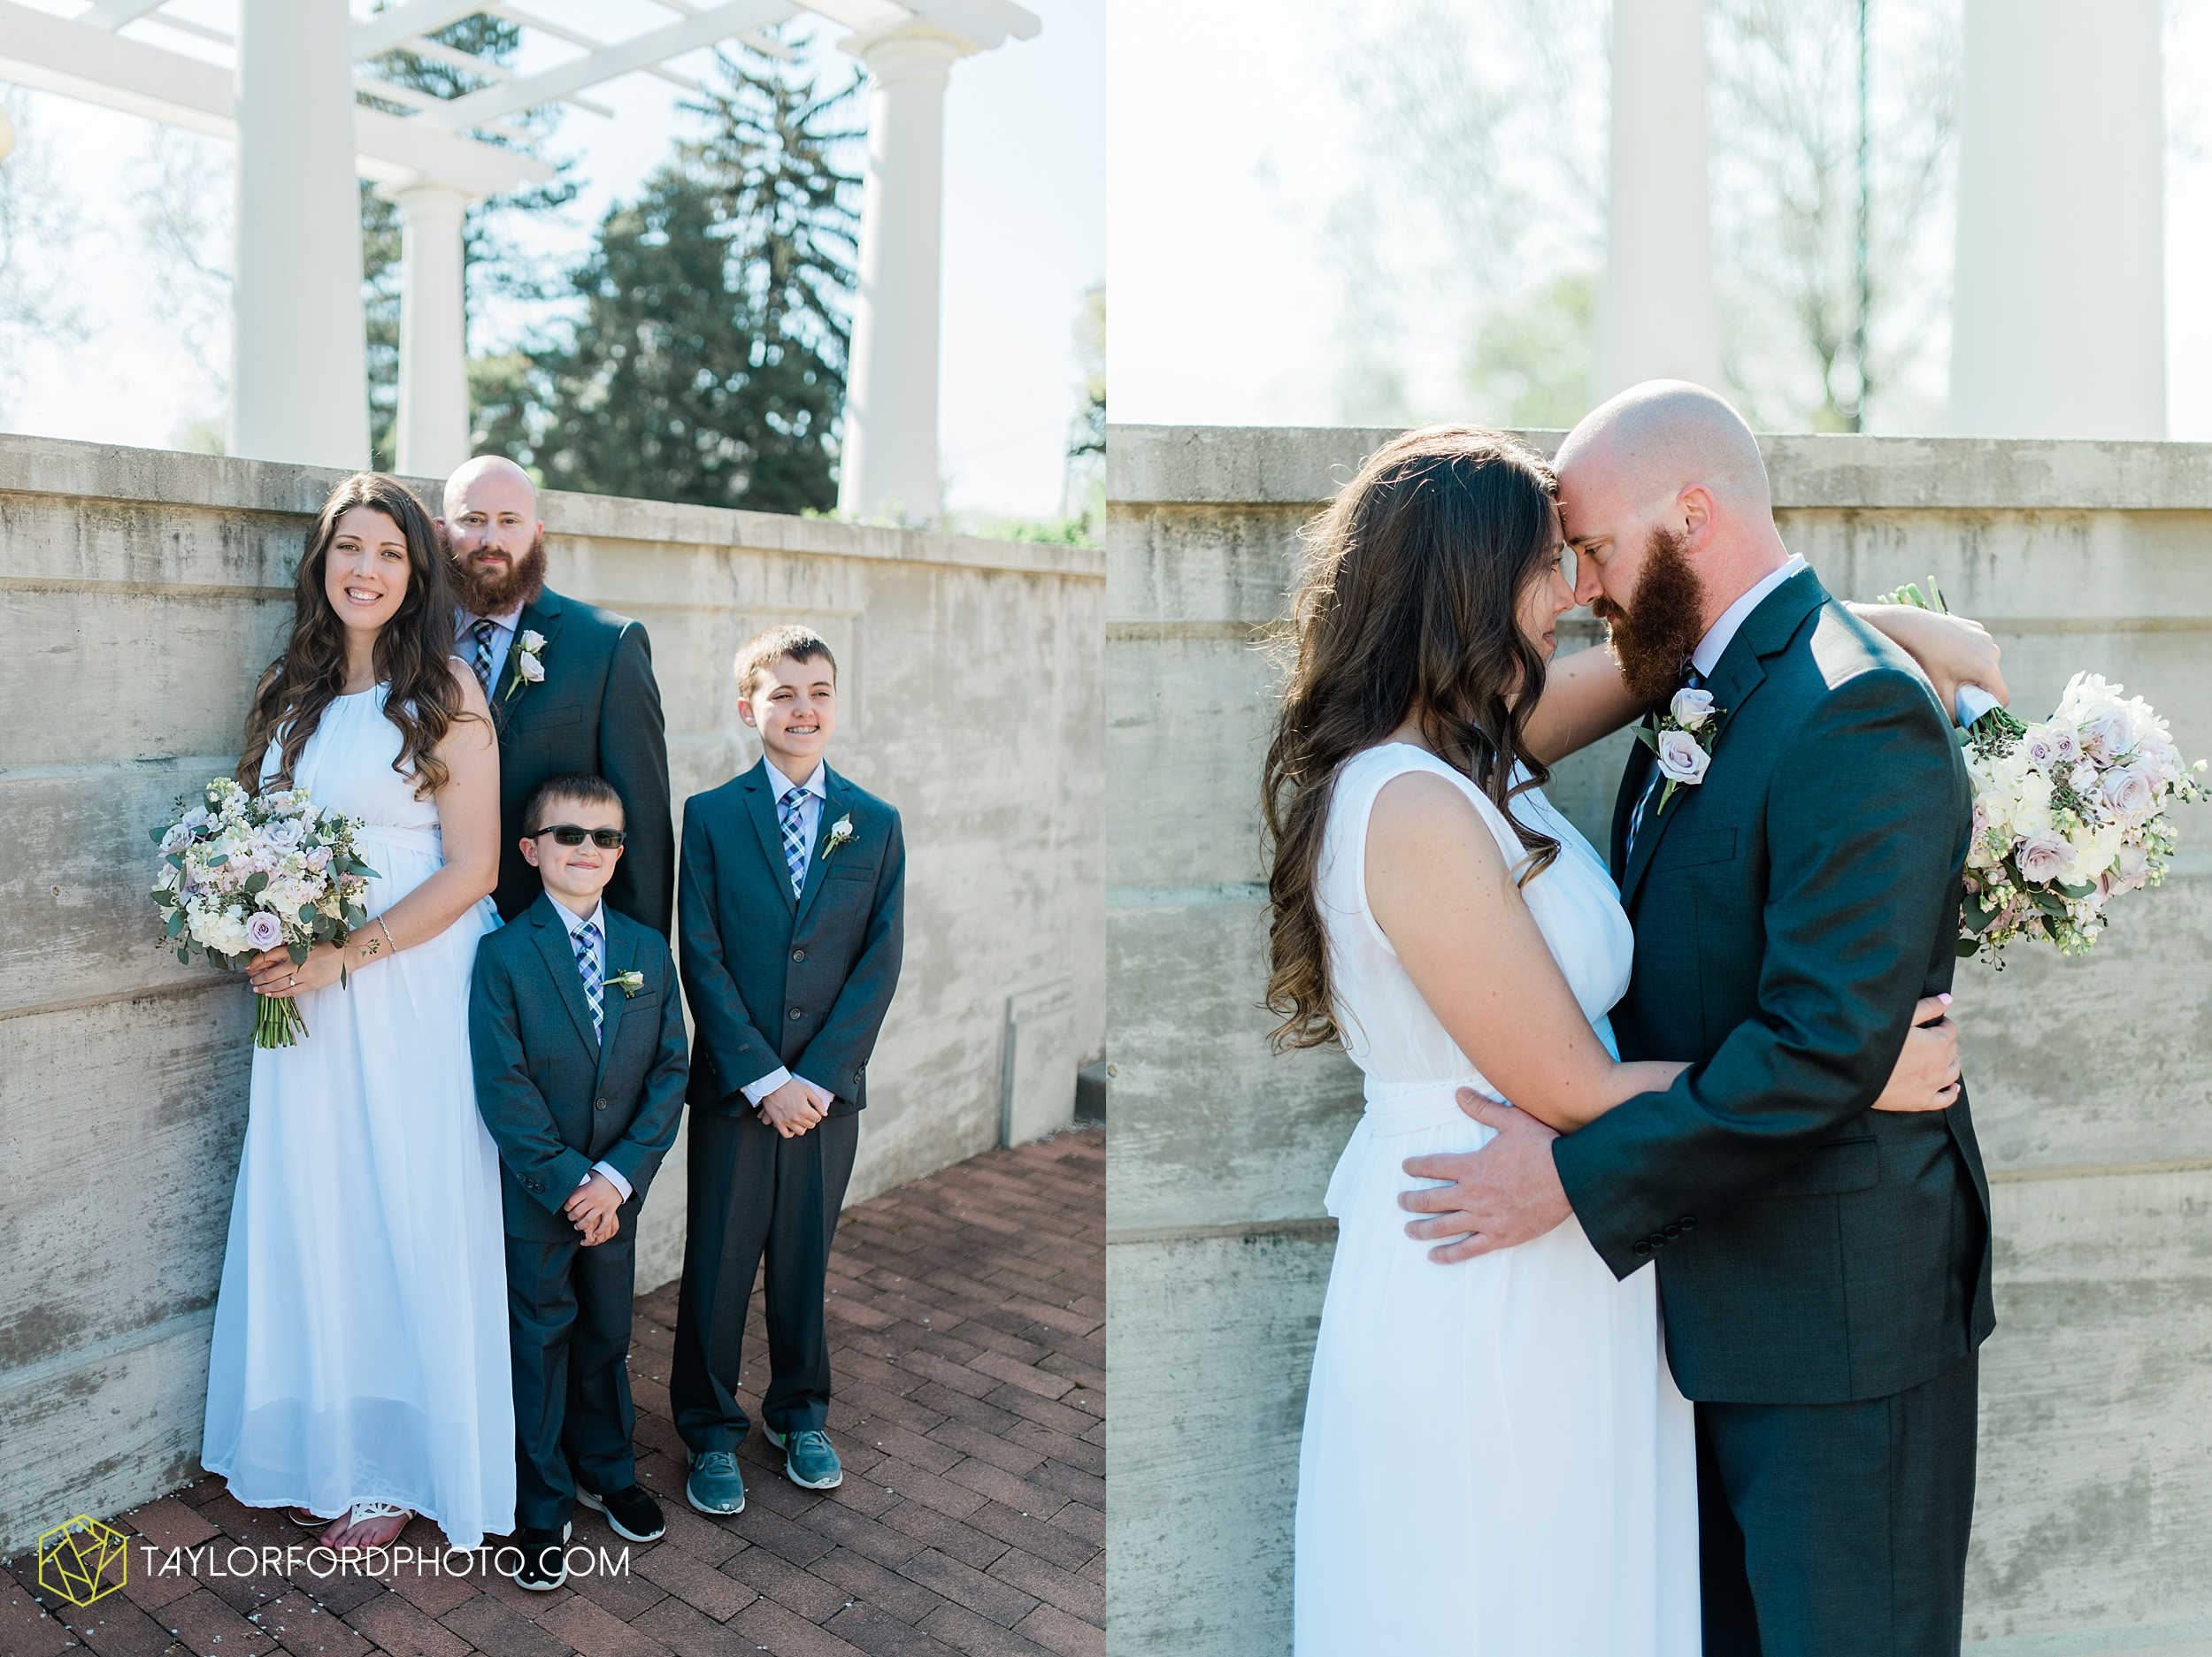 lakeside-rose-gardens-fort-wayne-indiana-elopement-wedding-photographer-Taylor-Ford-Photography_7154.jpg